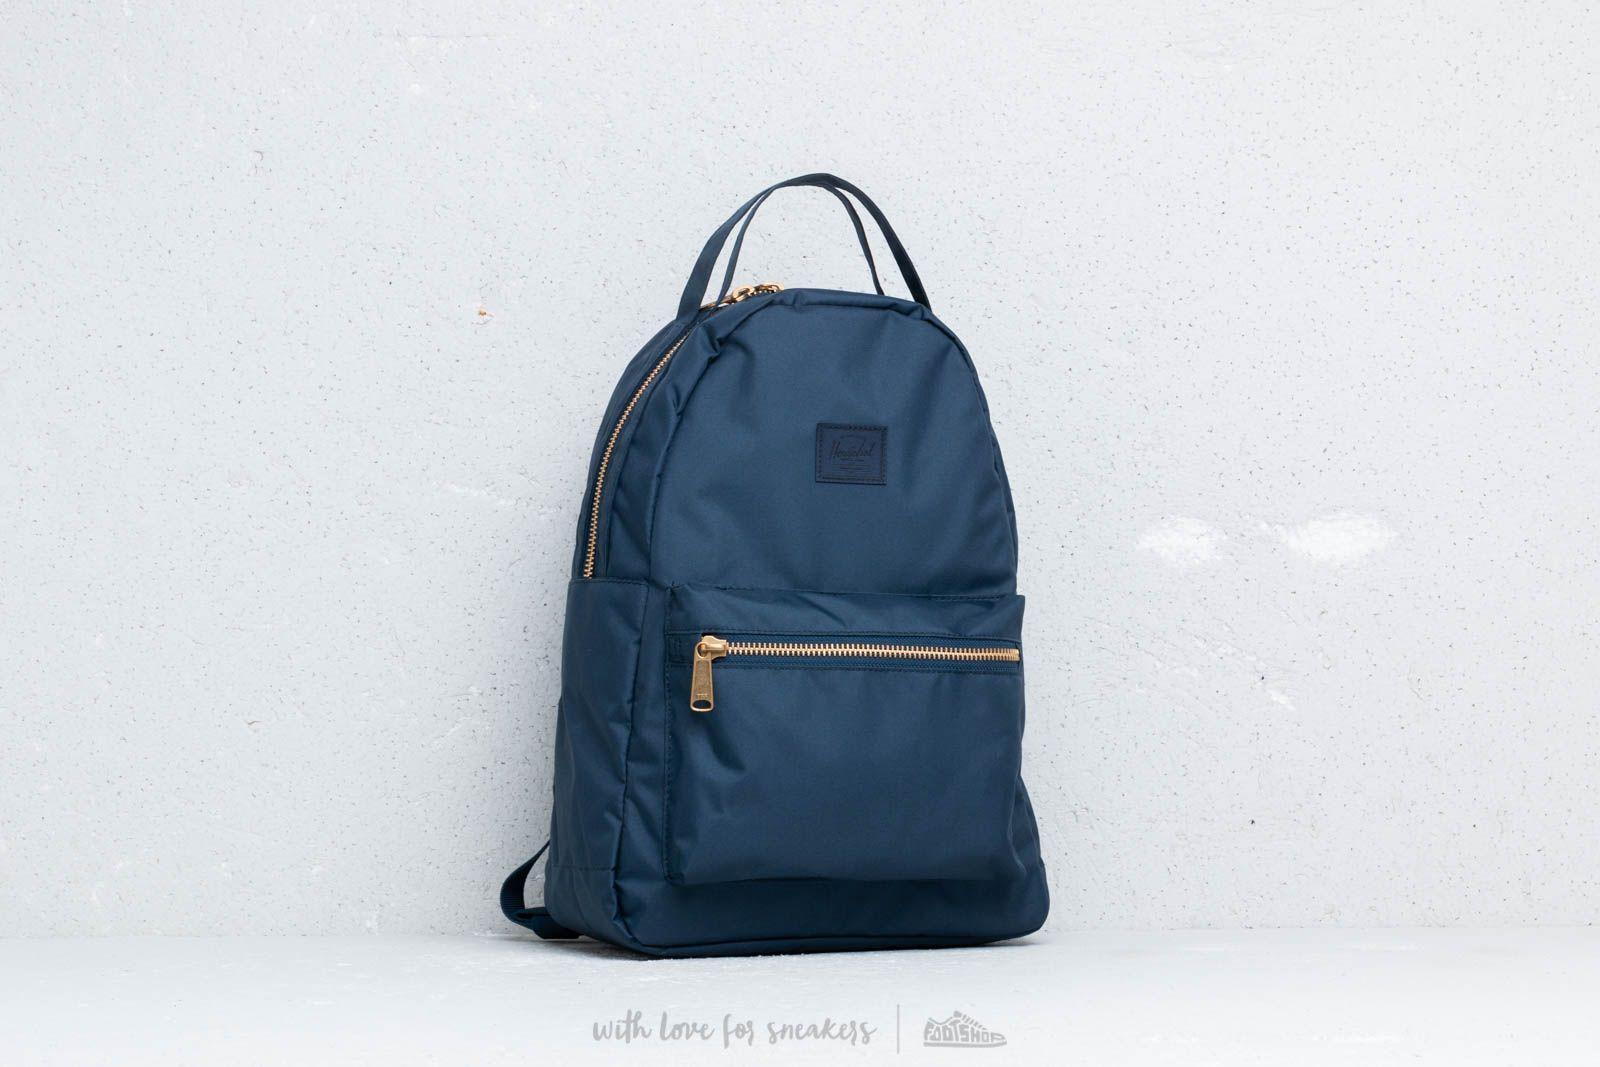 Herschel Supply Co. Light Nova Backpack